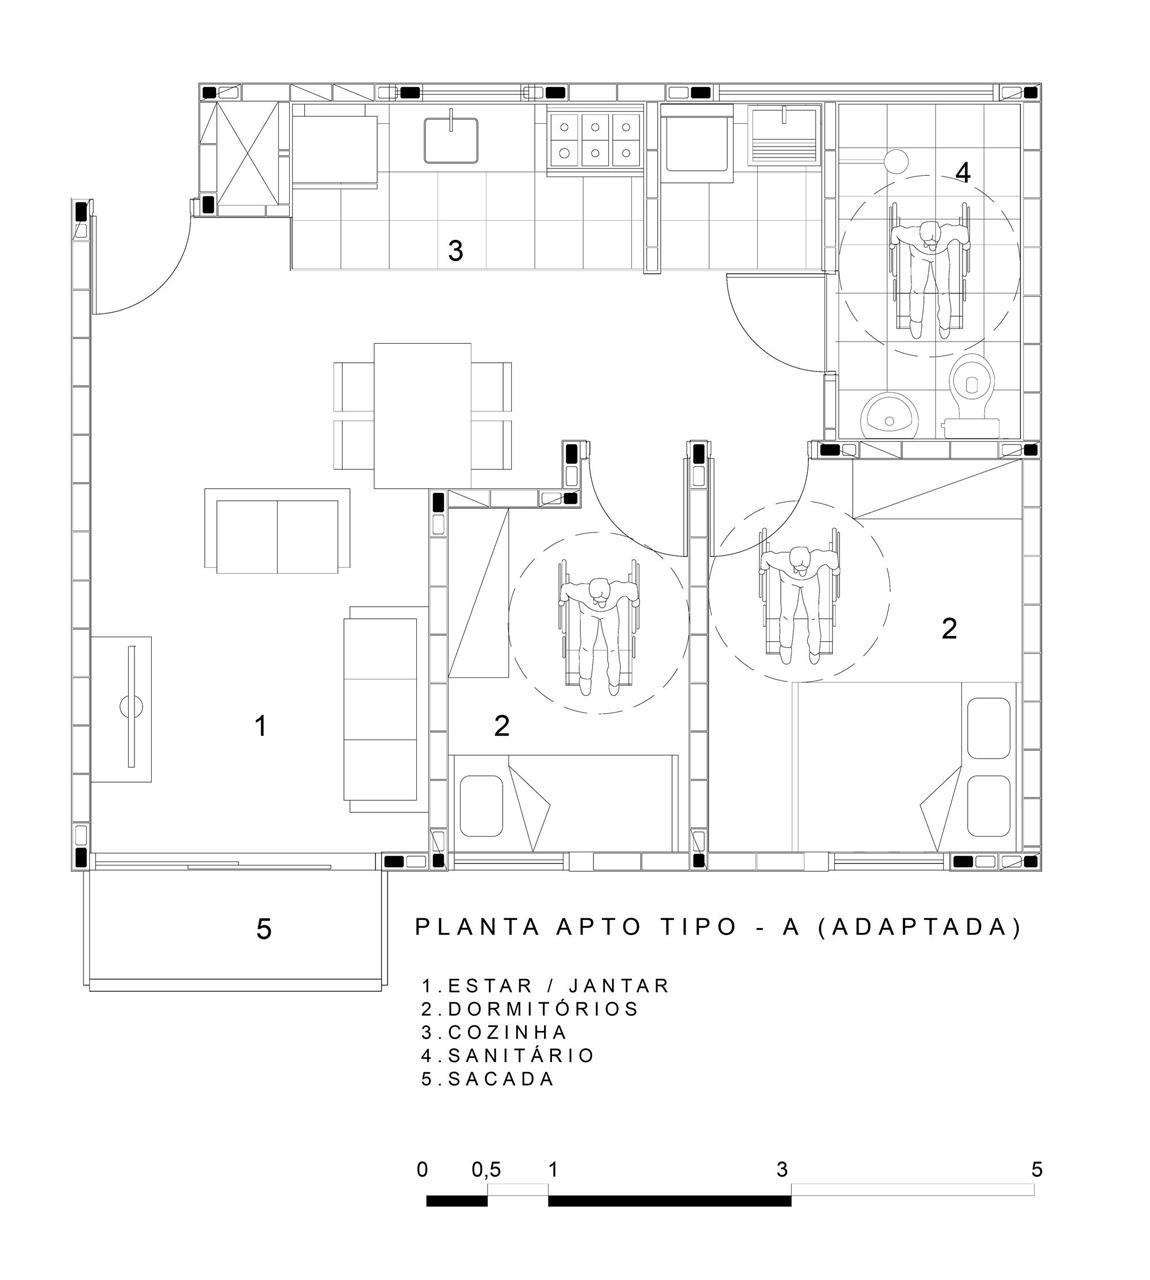 Galeria de HIS Conjunto Heliópolis Gleba G / Biselli   Katchborian  #202020 1150 1280